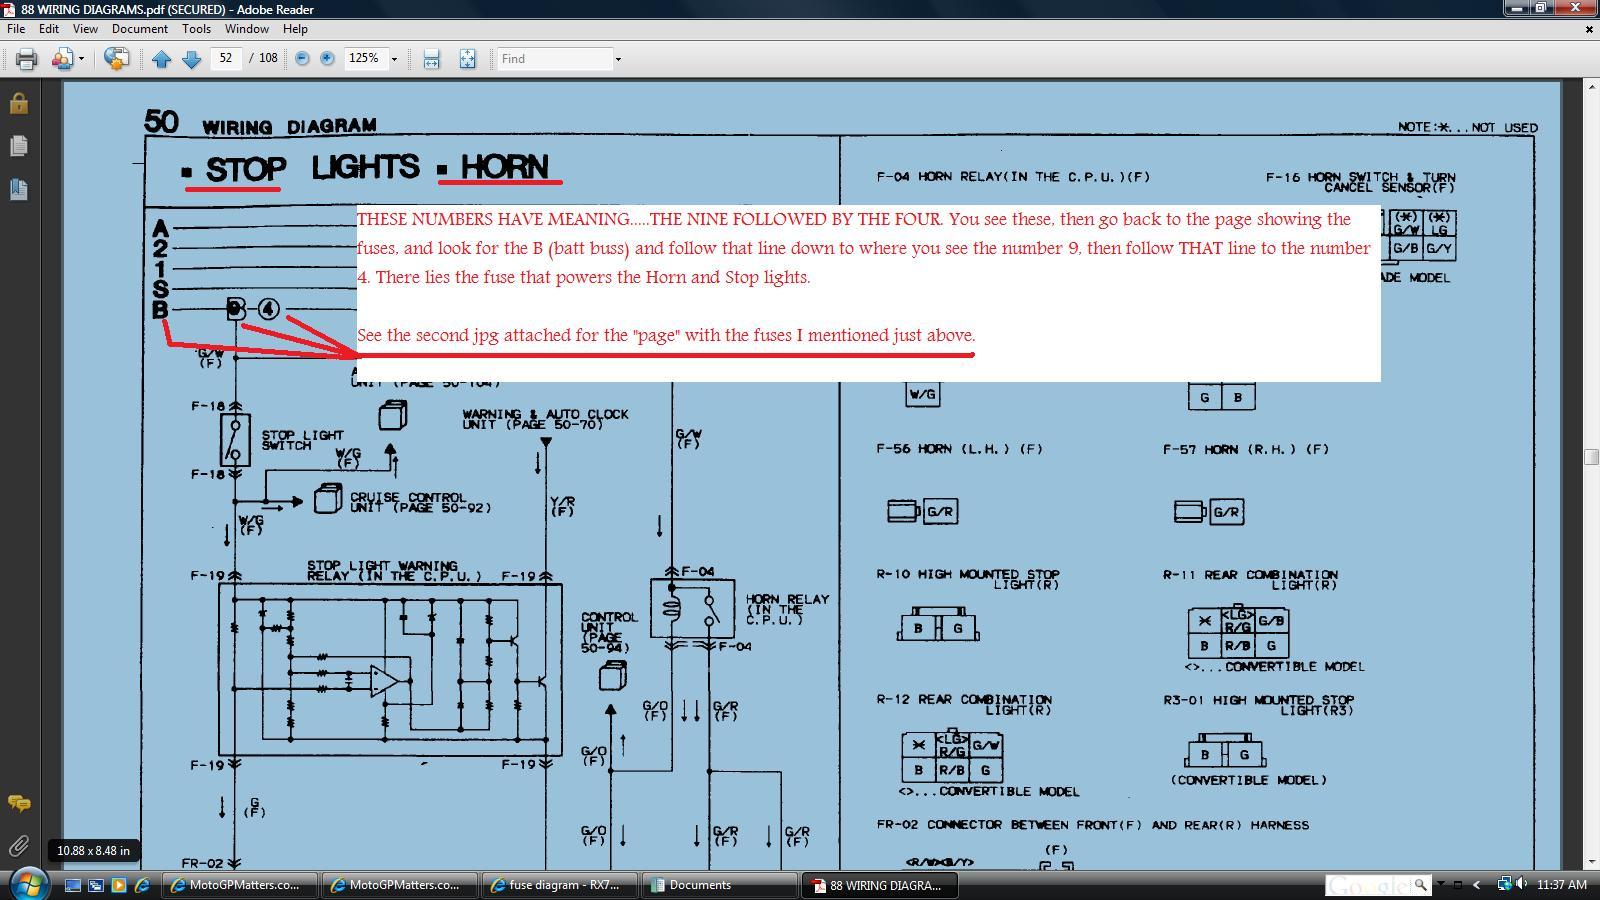 hight resolution of fuse diagram stopmehorn jpg